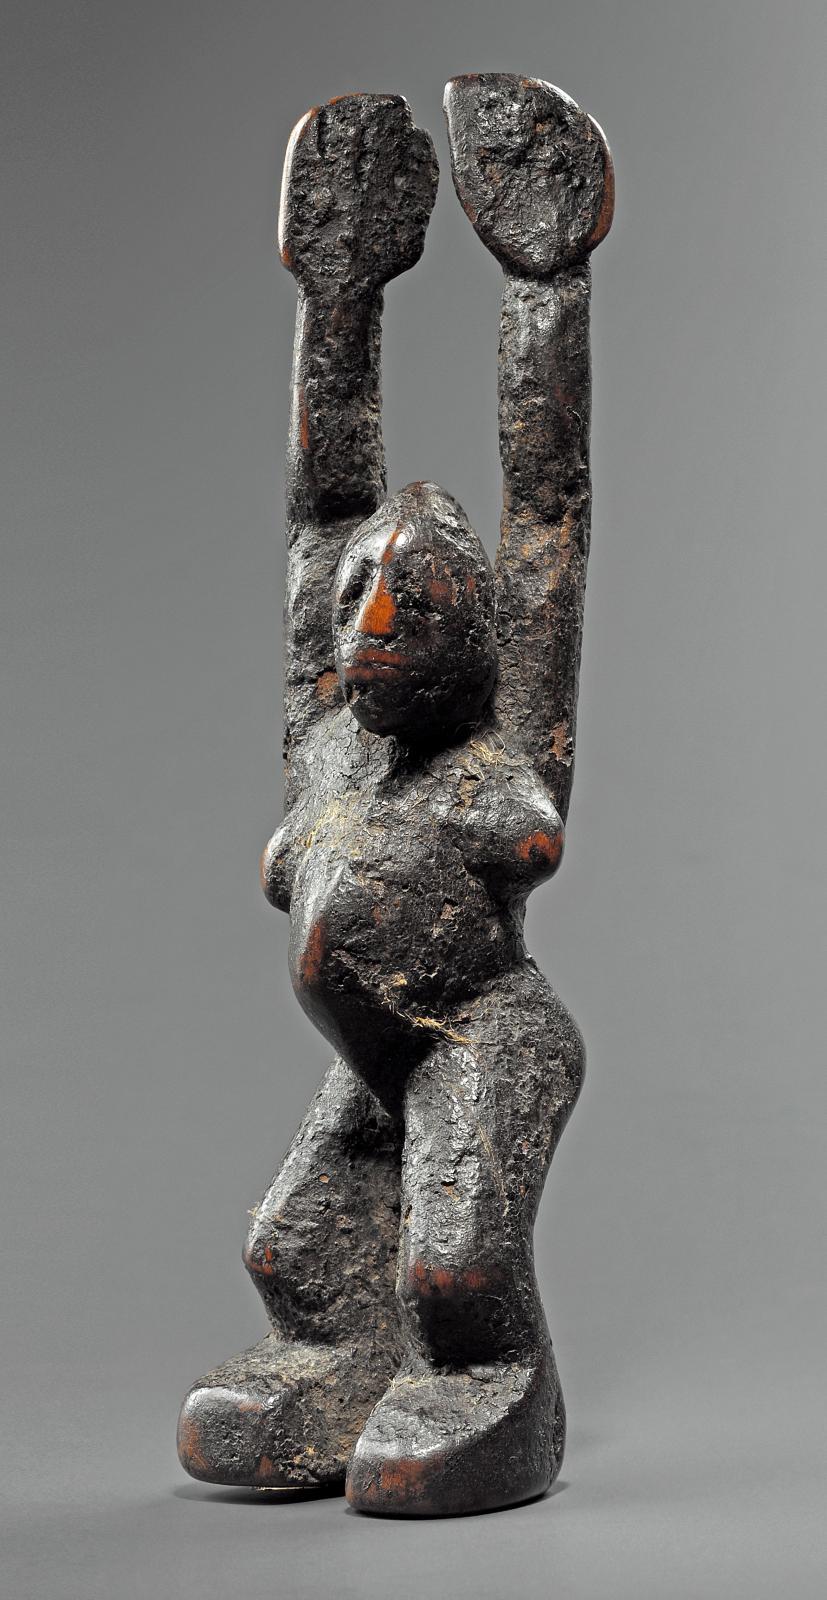 Statuette buthib lobi, style dagara-lobr, Burkina Faso, bois, h.17cm. Estimation : 20000/30000€